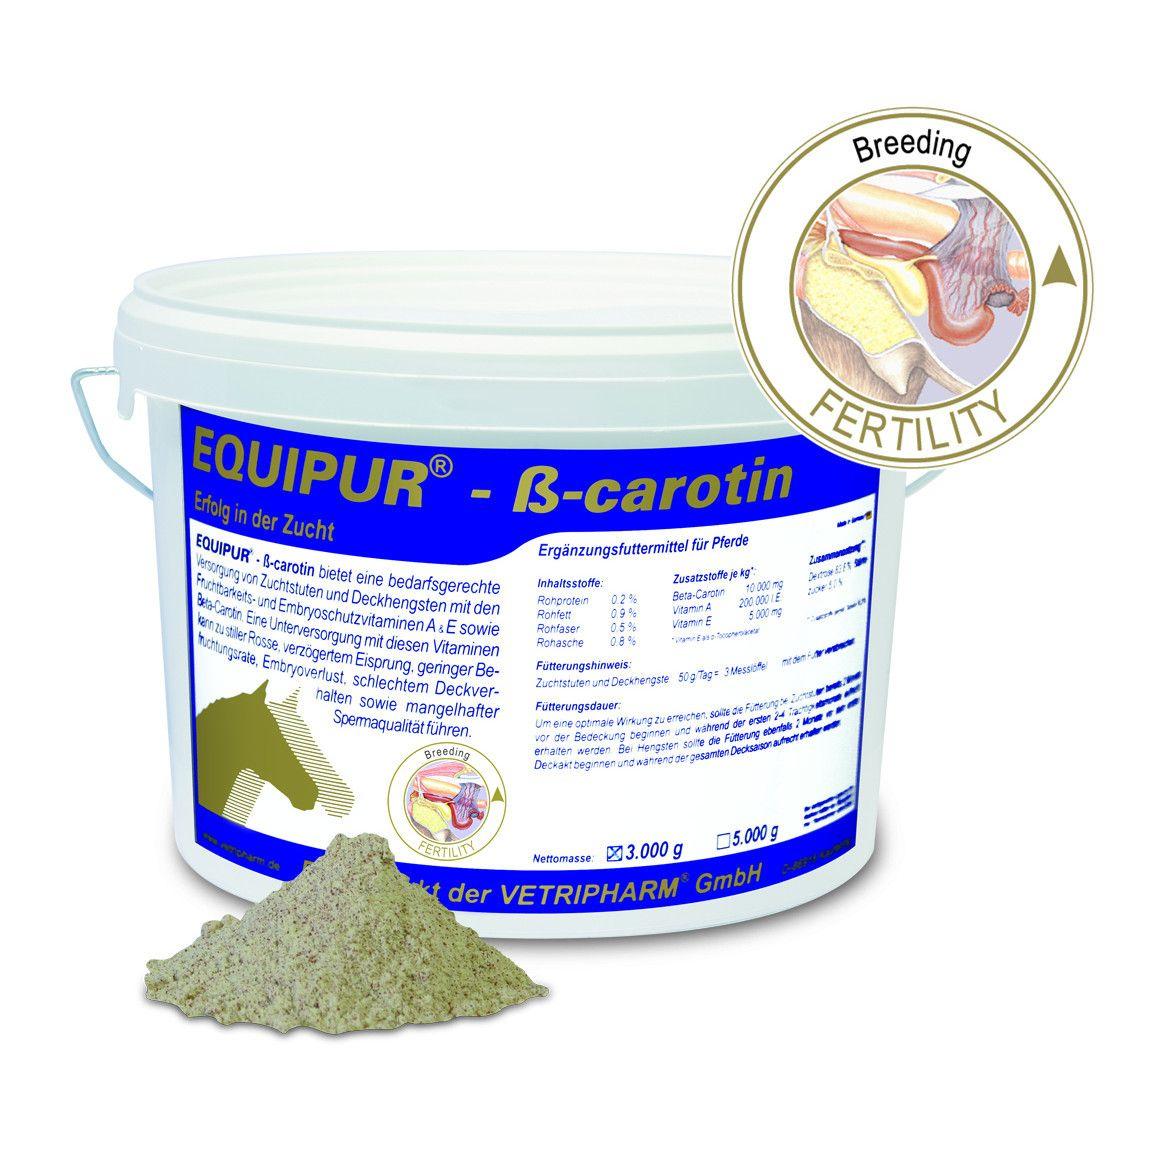 Vetripharm Equipur ß-carotin